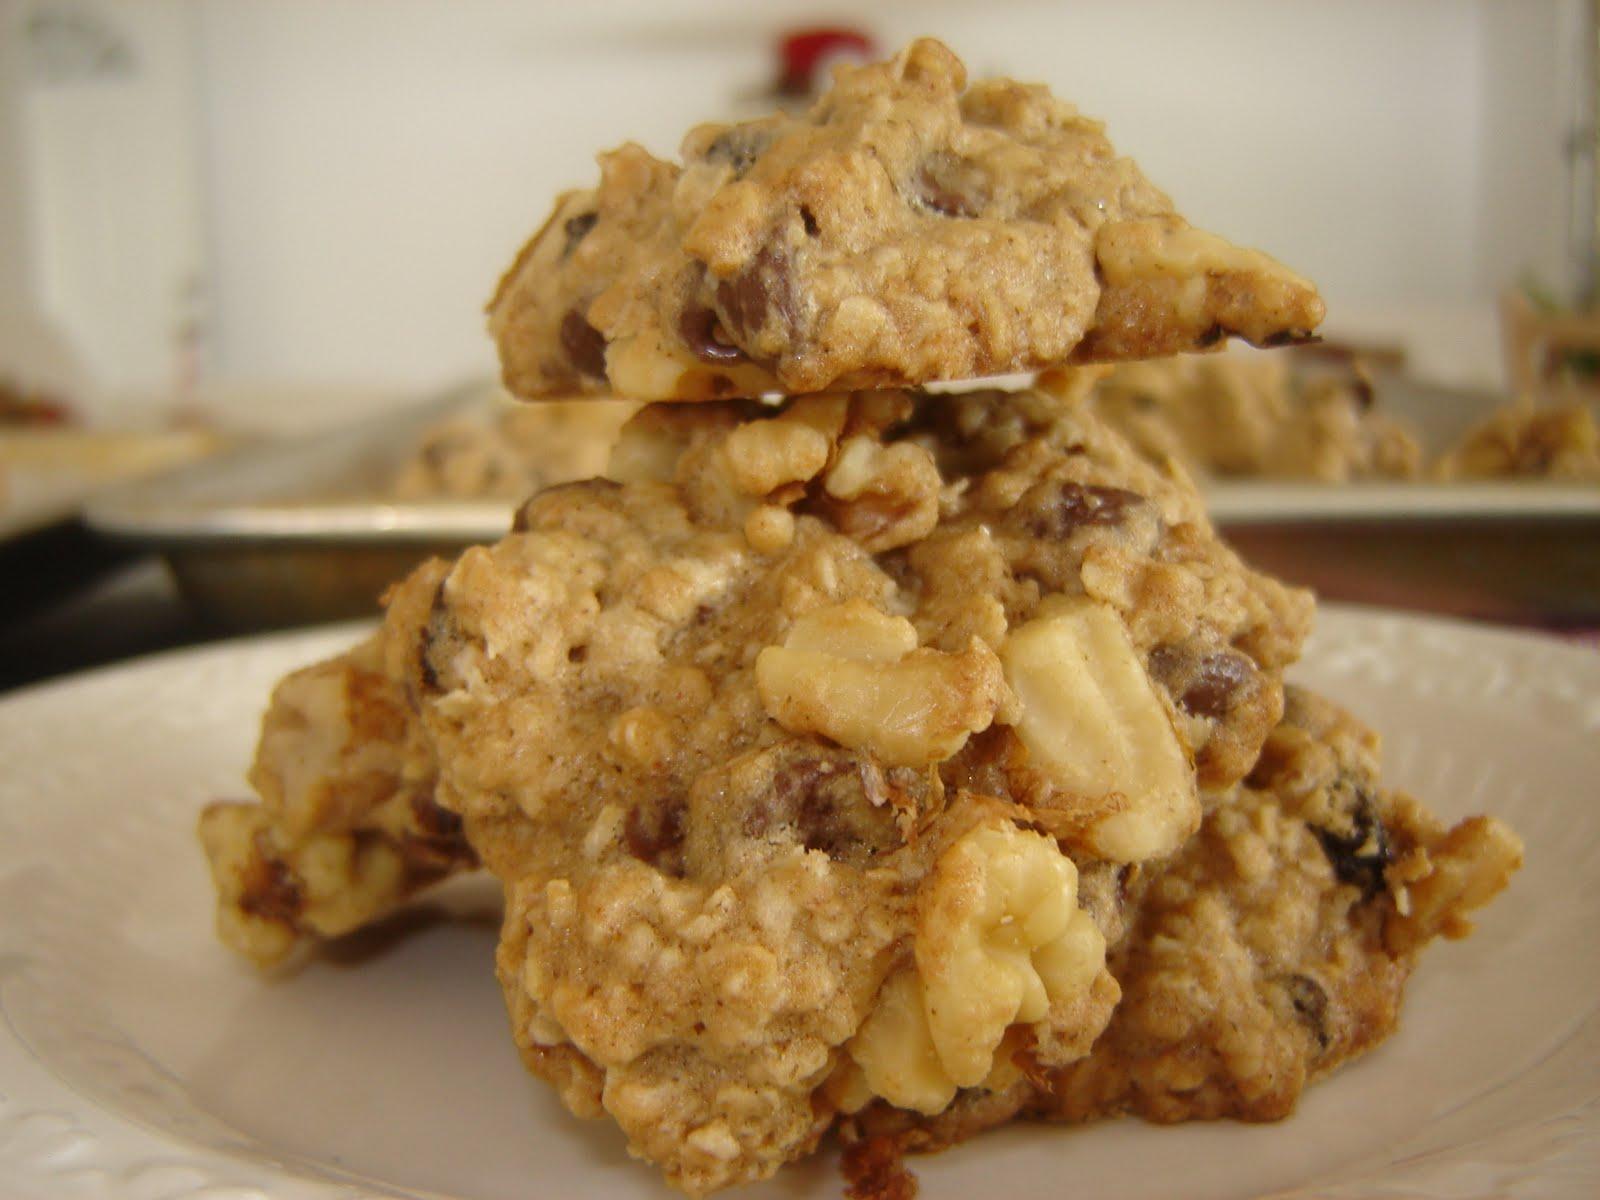 eatamarthacupcake: Oatmeal Raisin Chocolate Chip Cookie